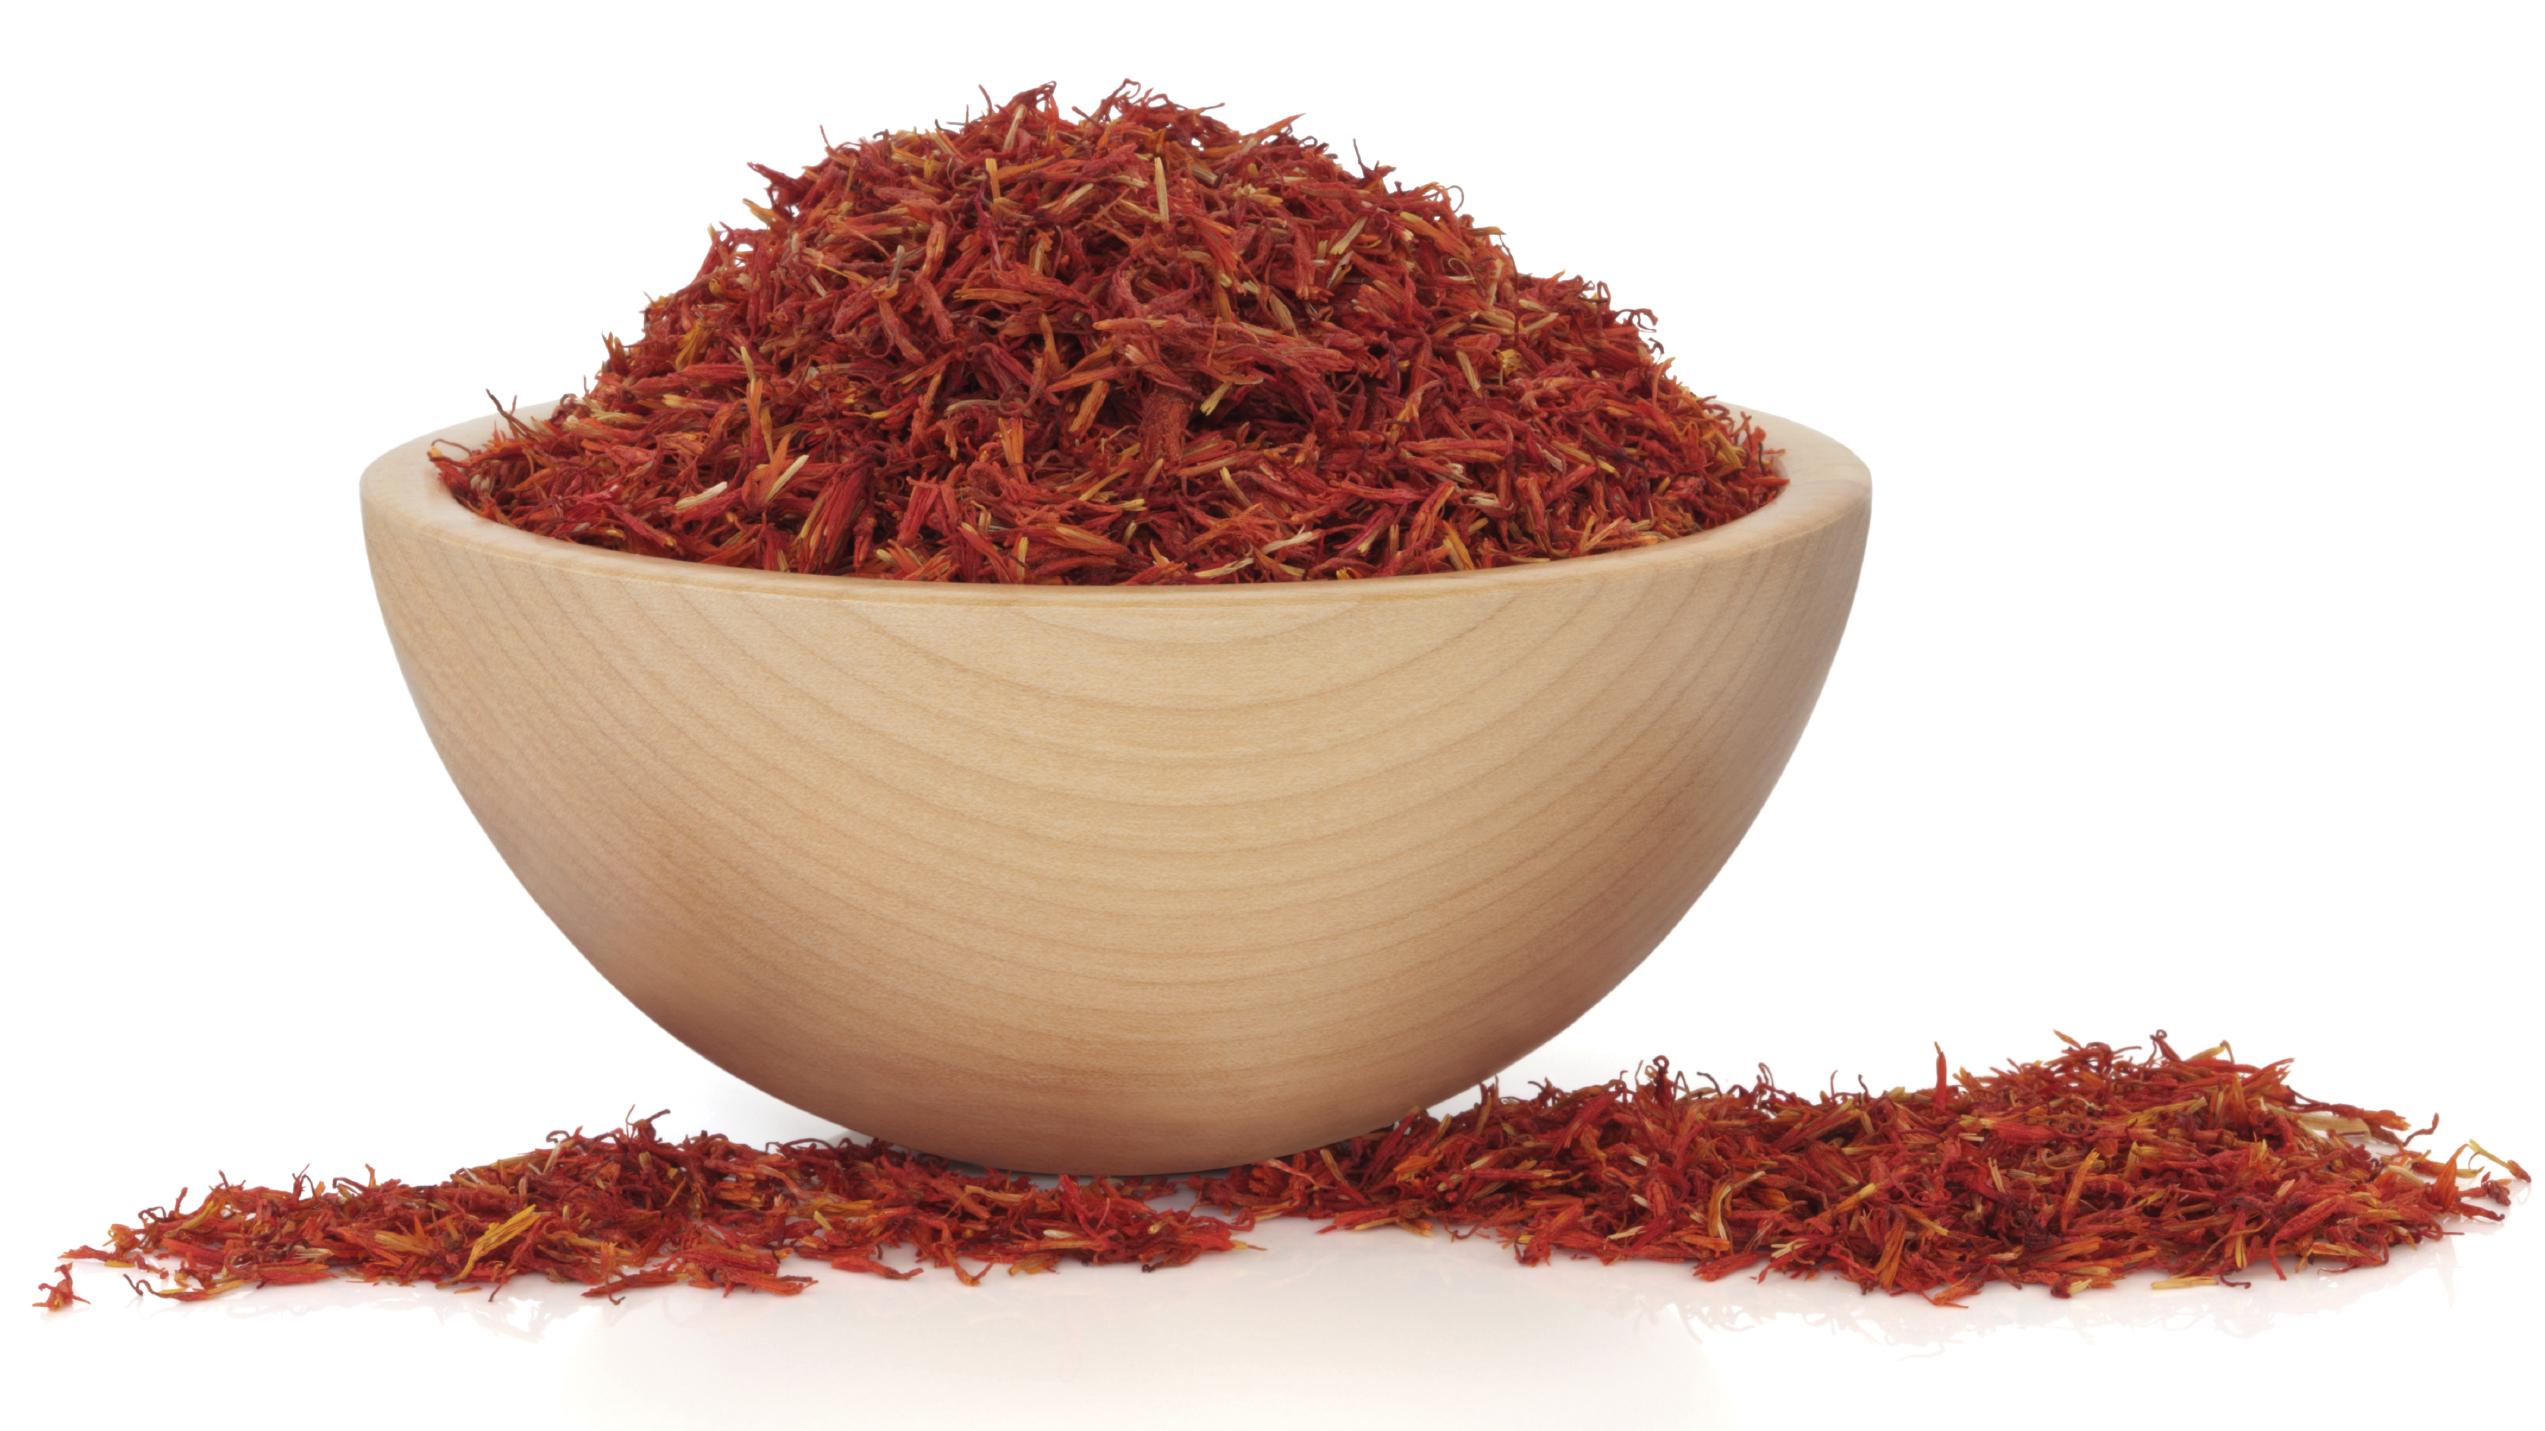 Demystifying Saffron: Mark Bittman Explains The Pricey Spice